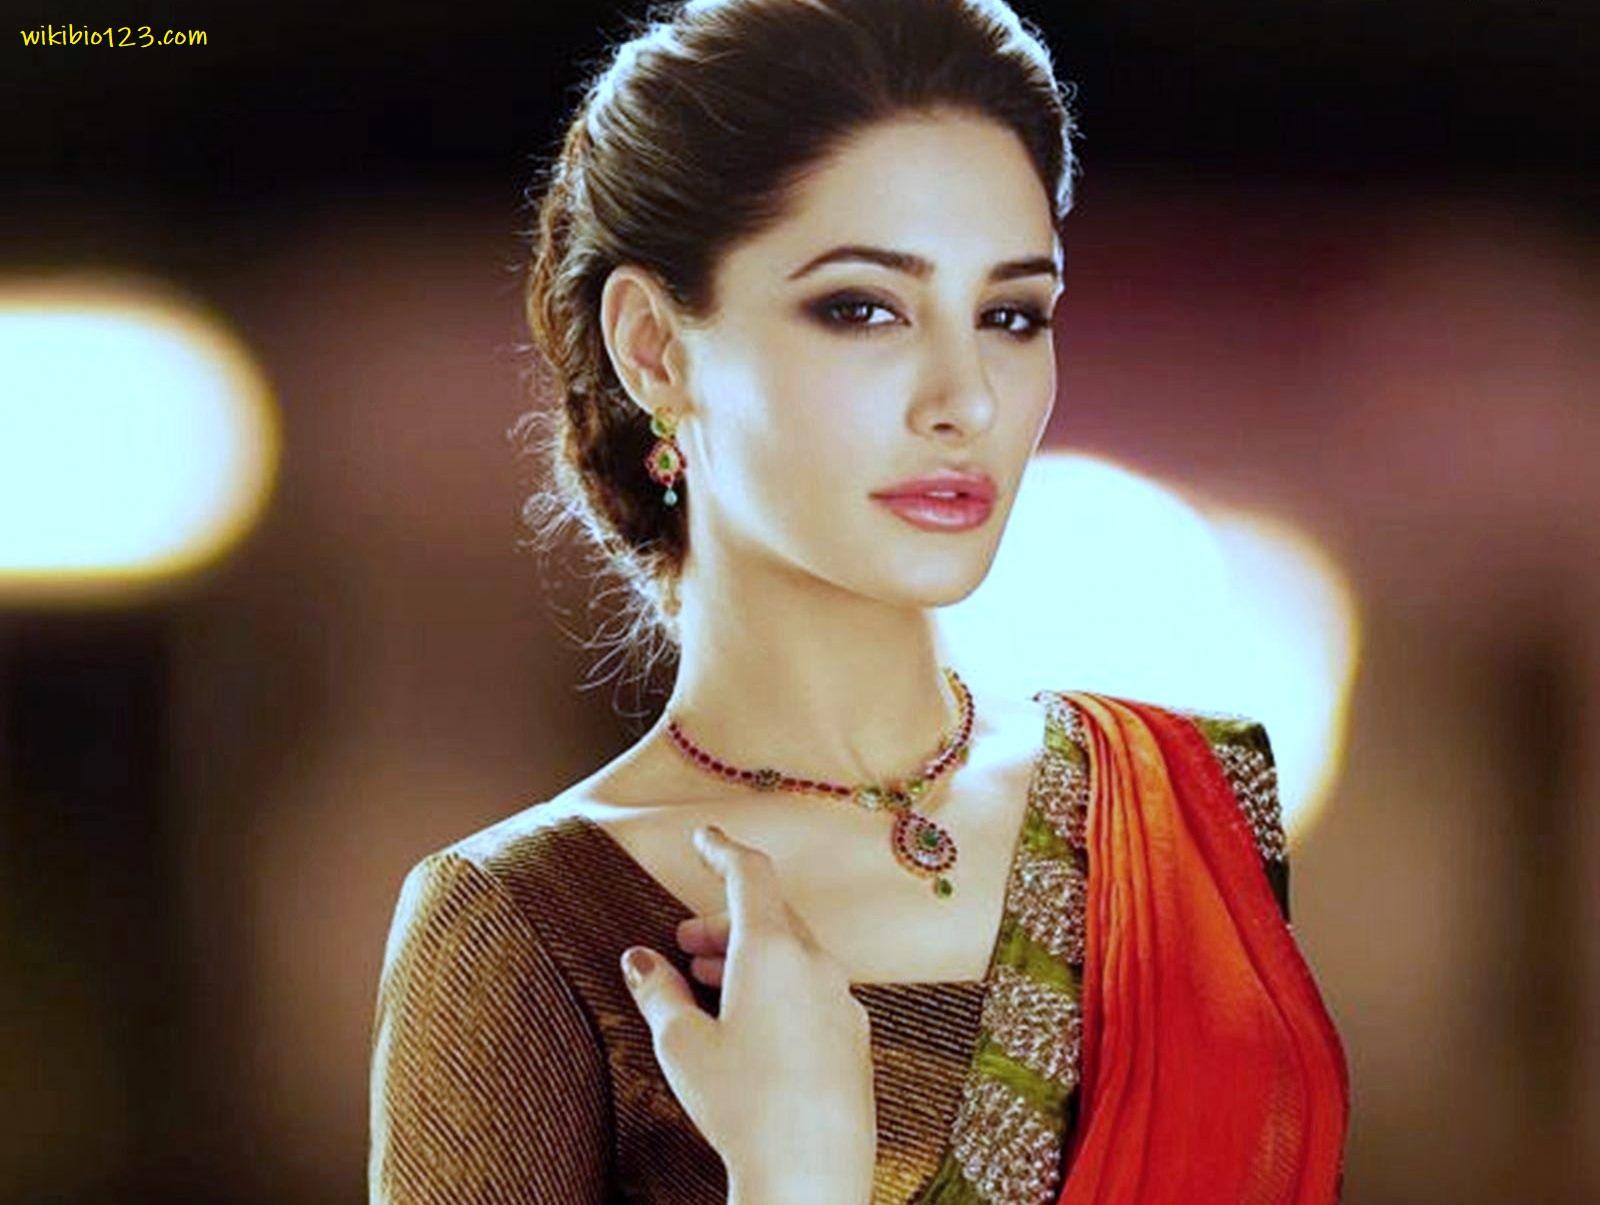 Nargis Fakhri HD Images Wallpapers Download